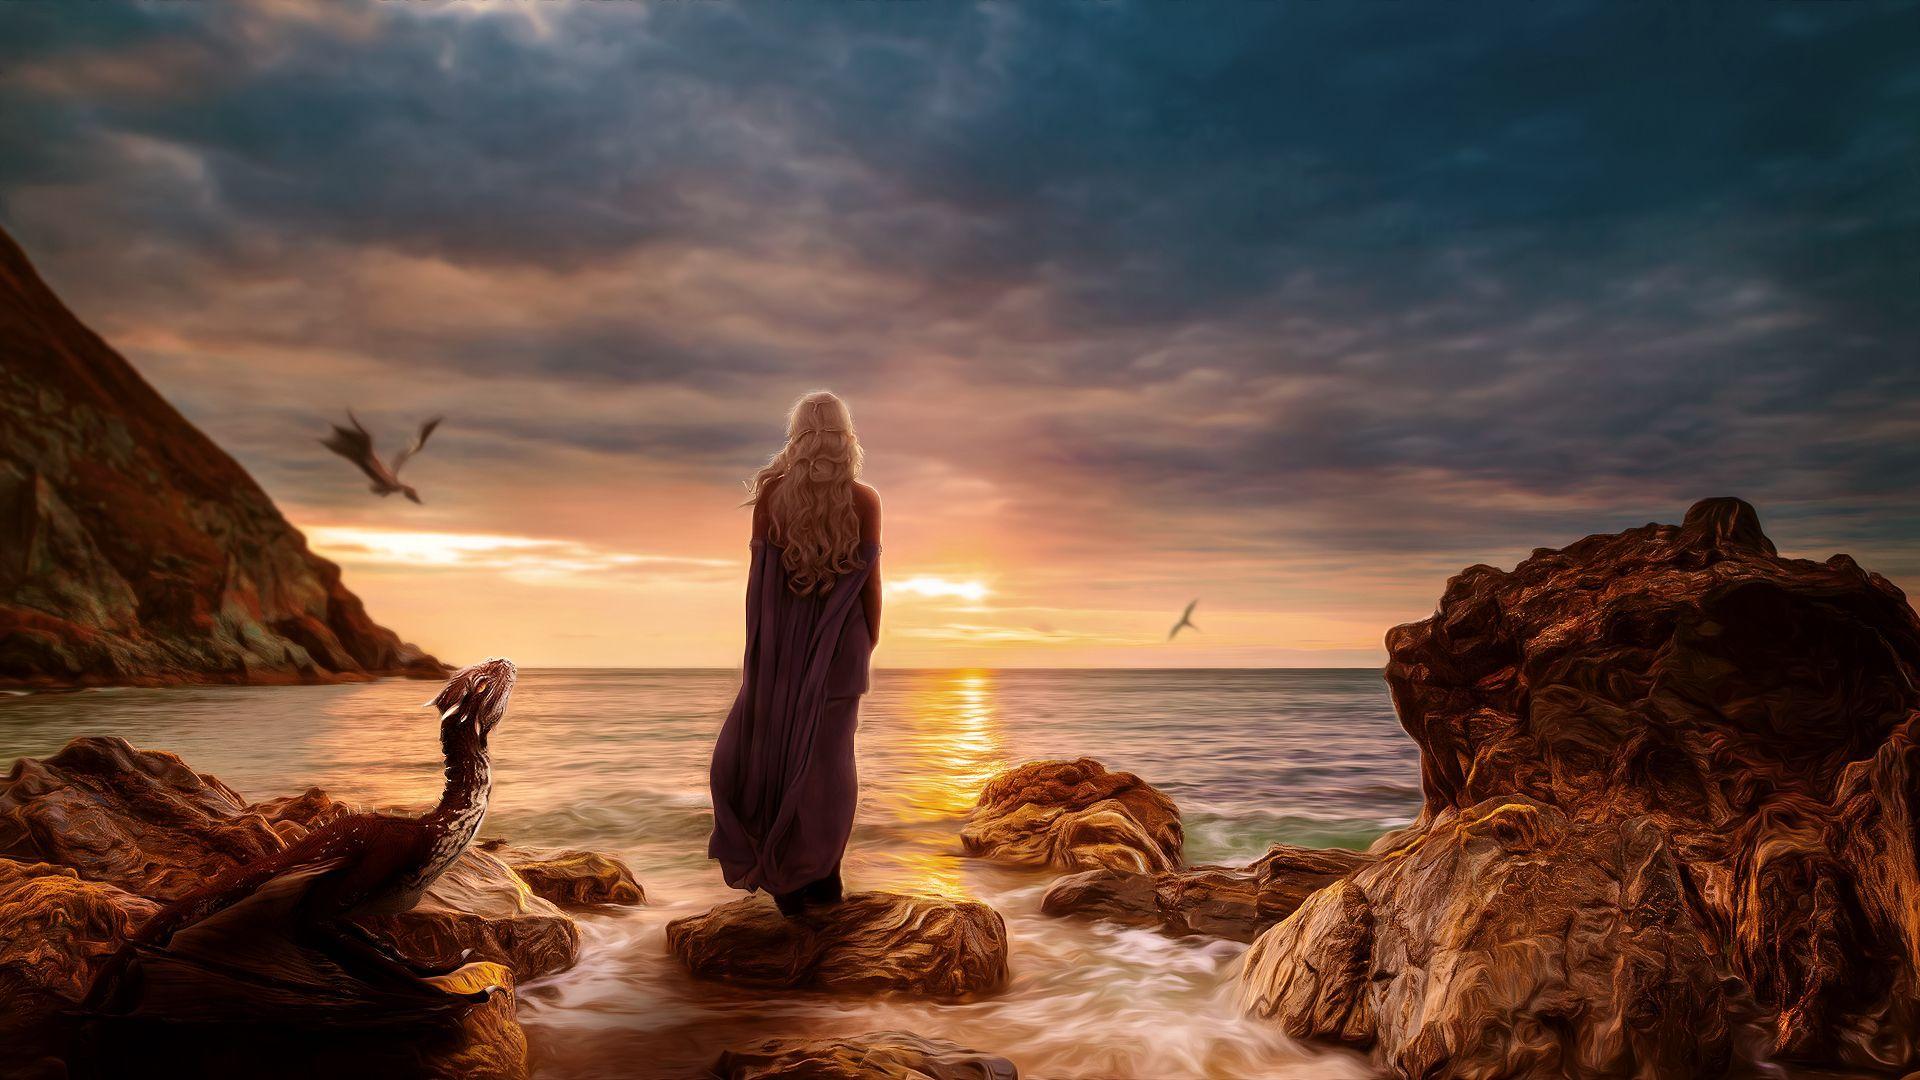 Game of Thrones landscape sea